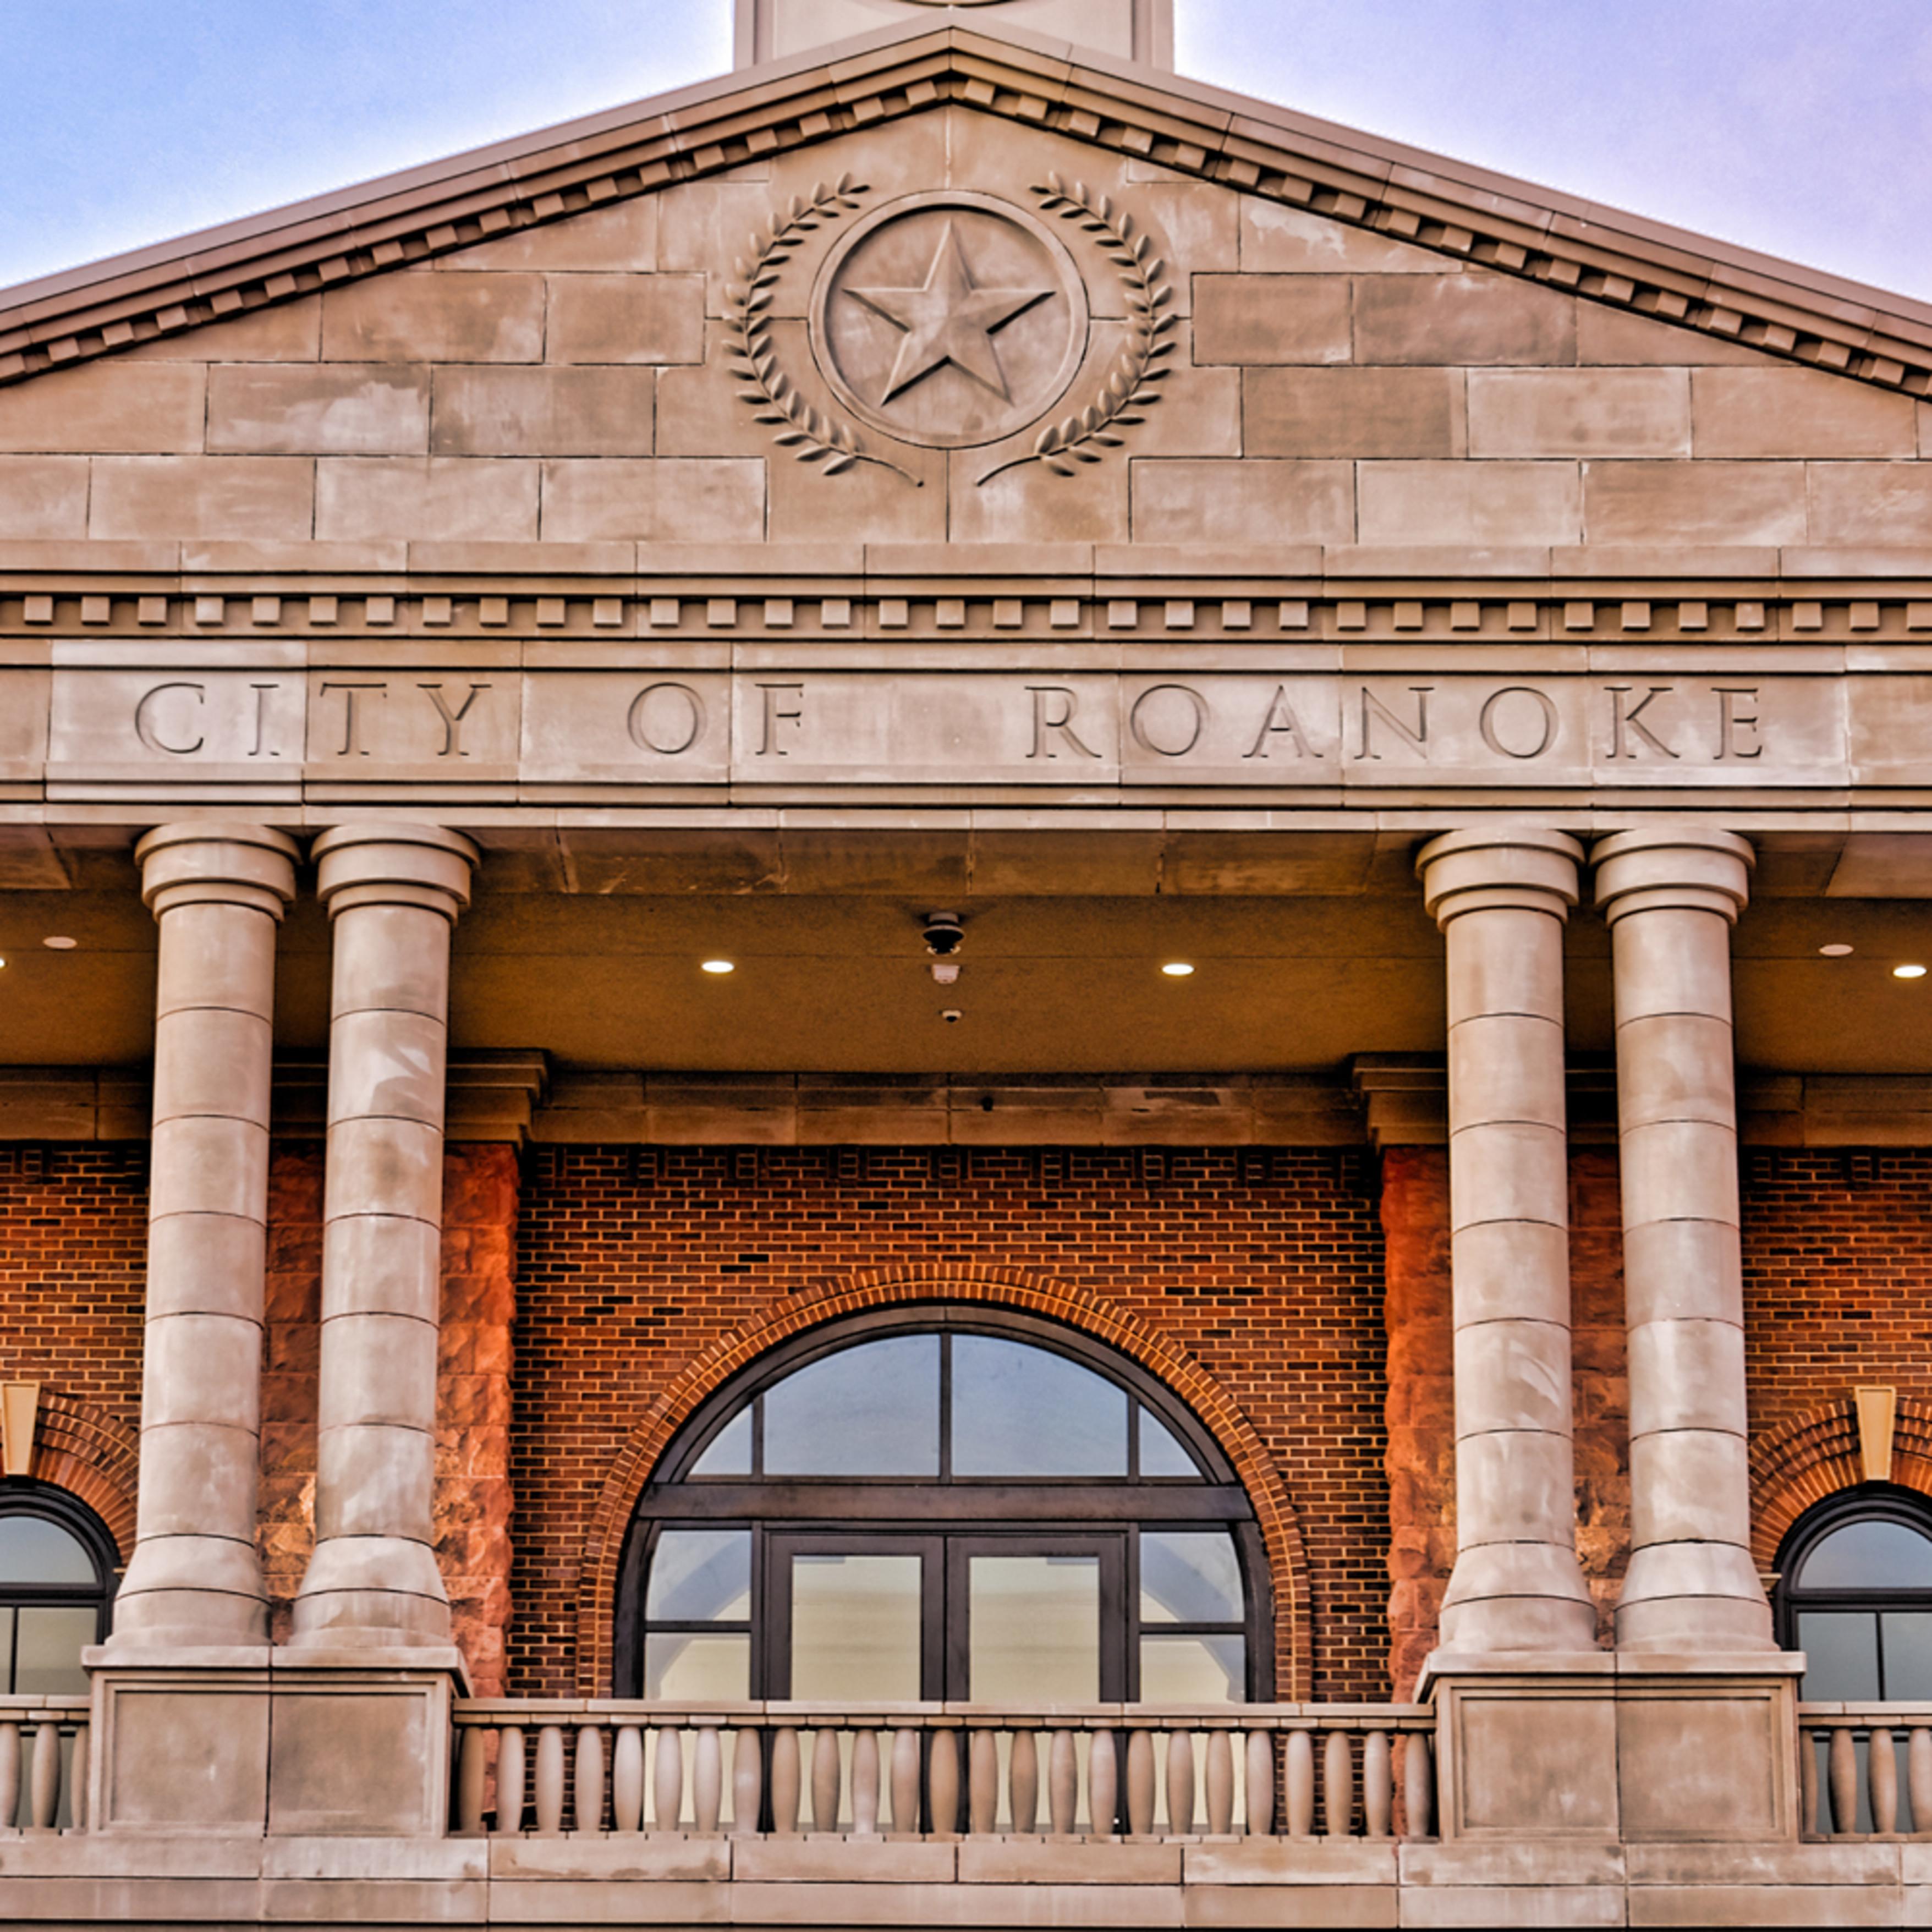 Roanoke town hall 22 detail bbv3zp